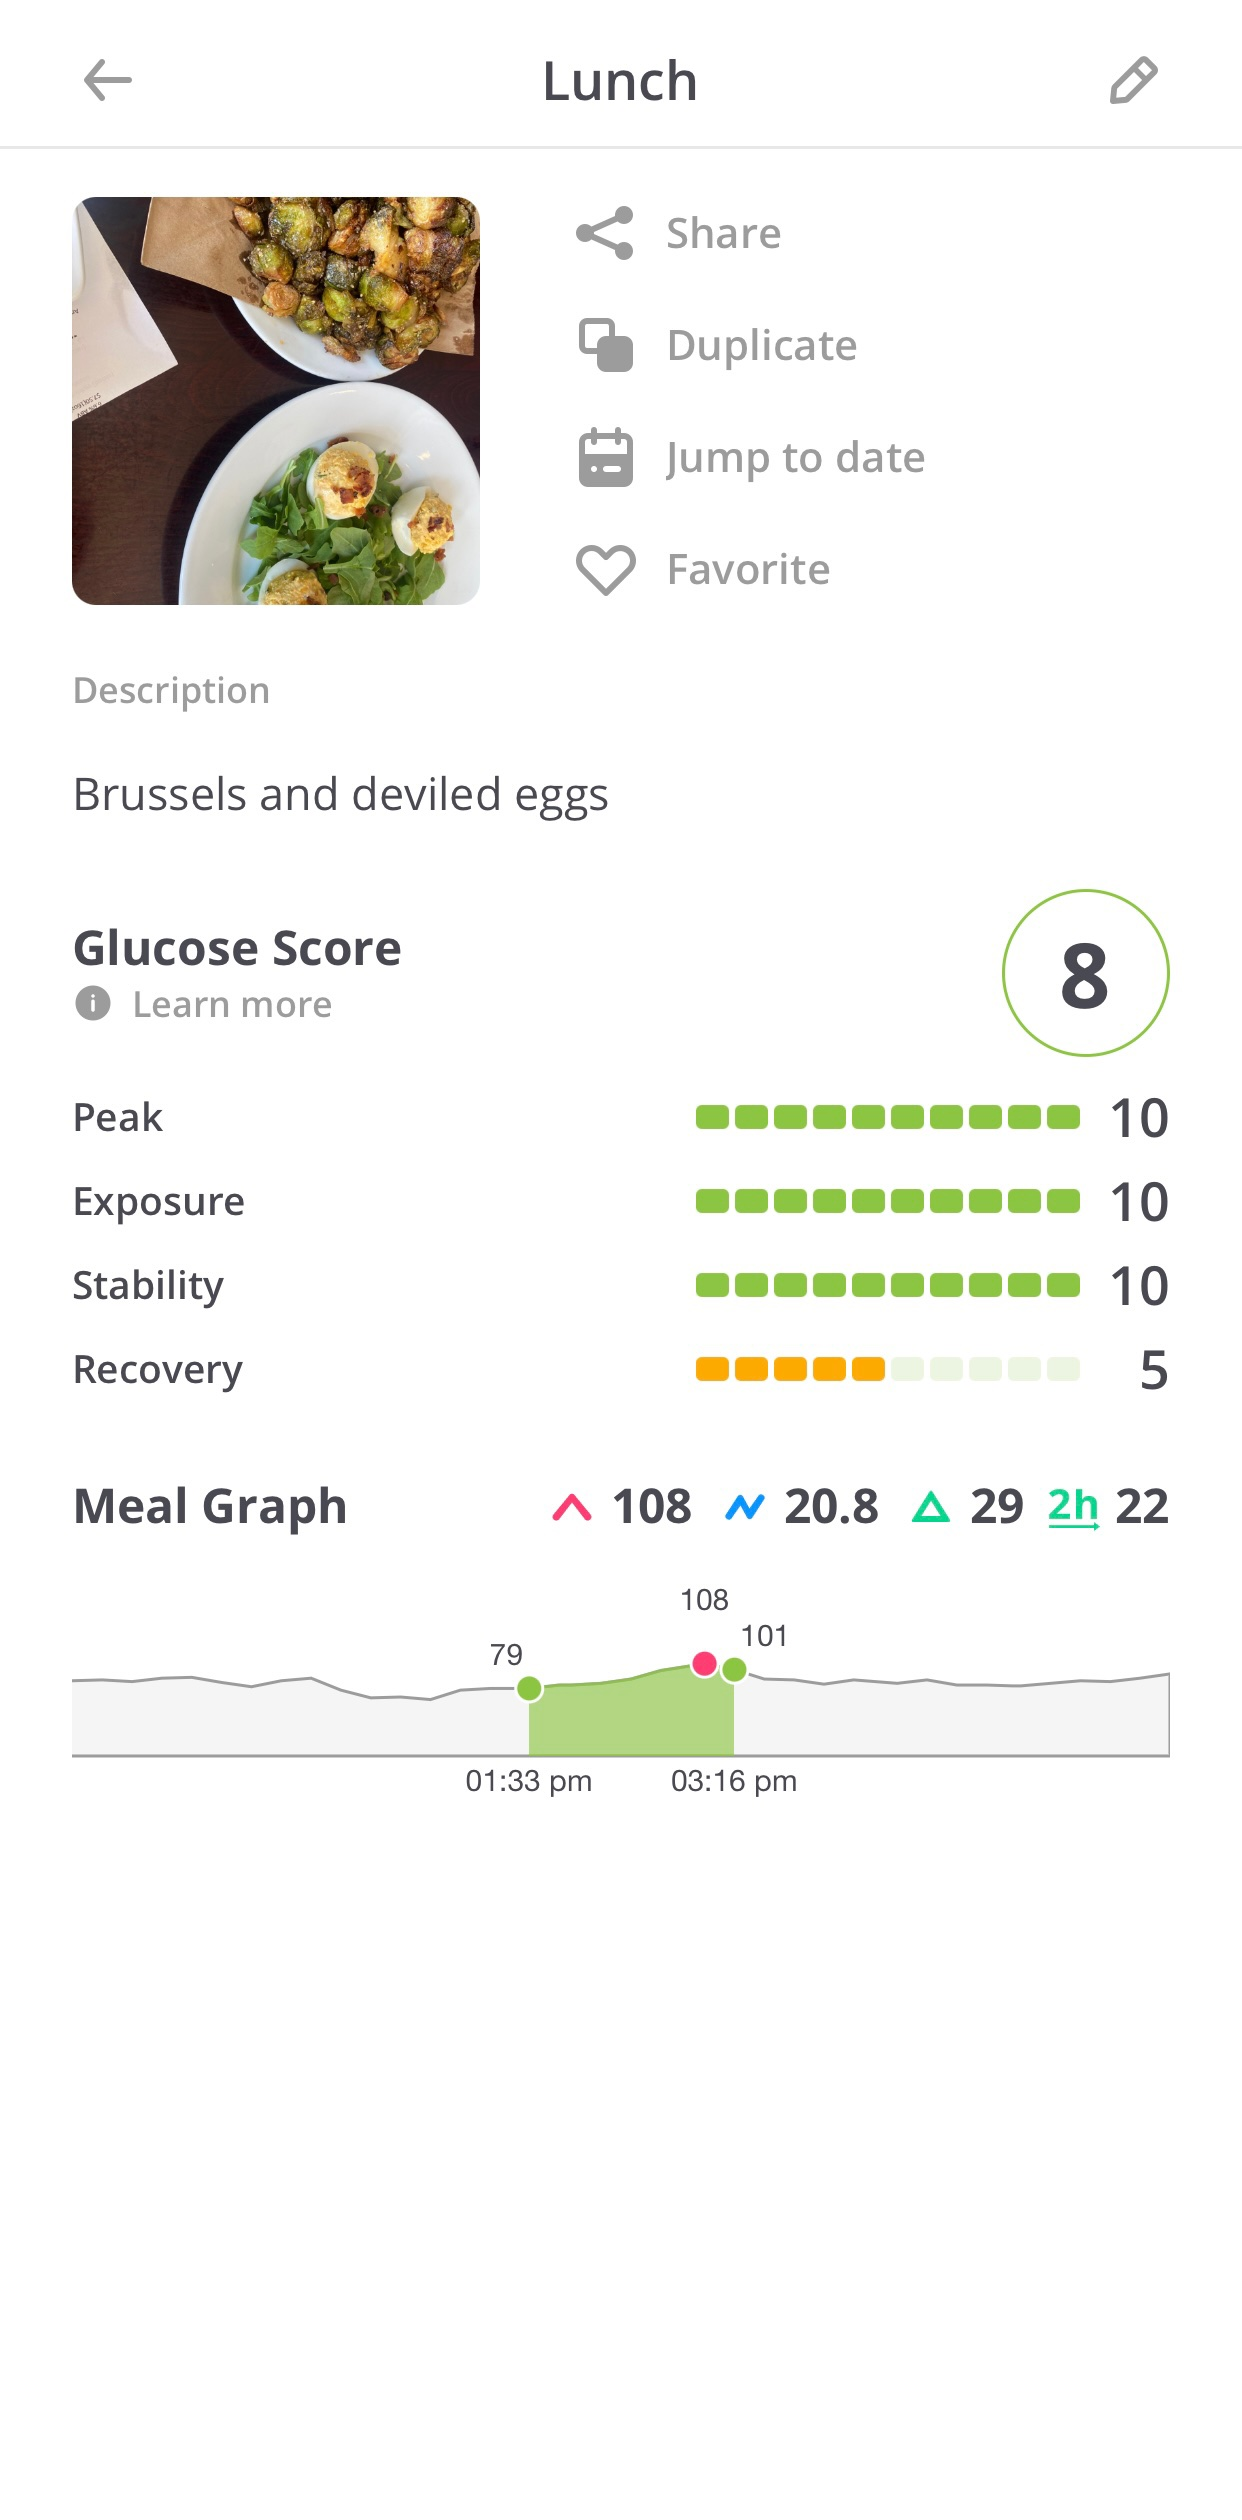 example of lunch logging in nutrisense app